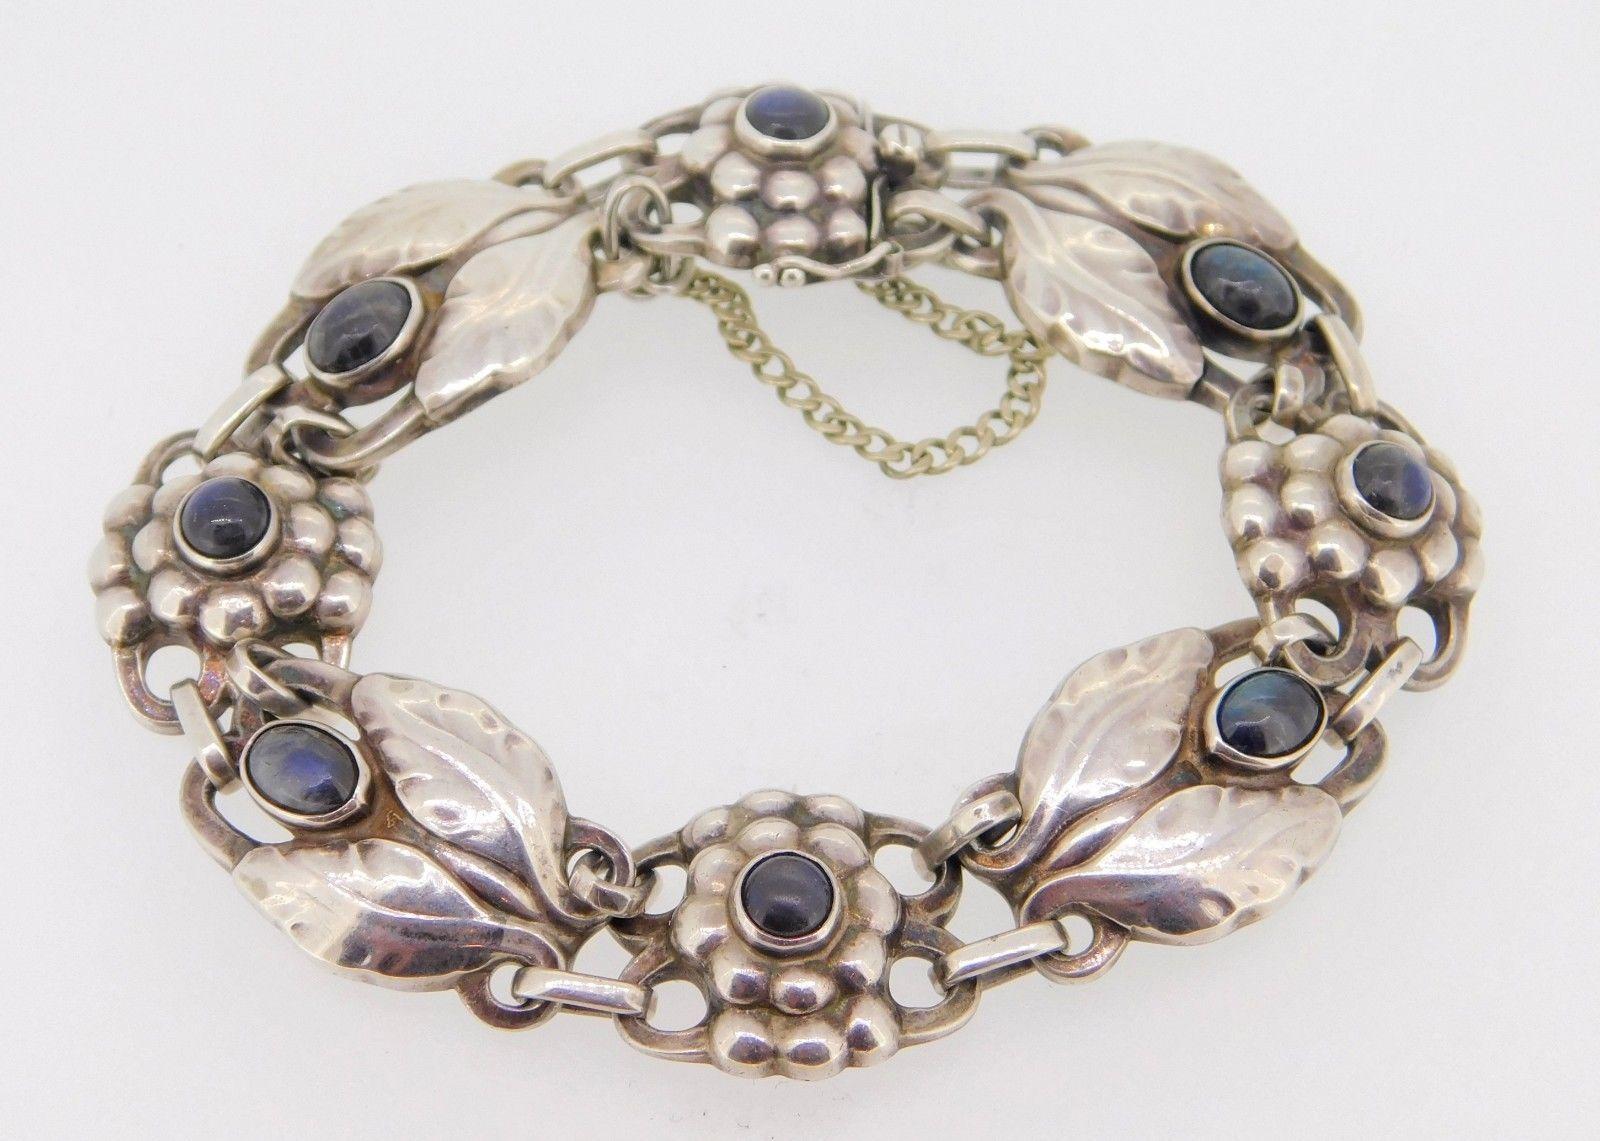 Georg Jensen Sterling Silver Bracelet #3 with Labradorites (#J3966)